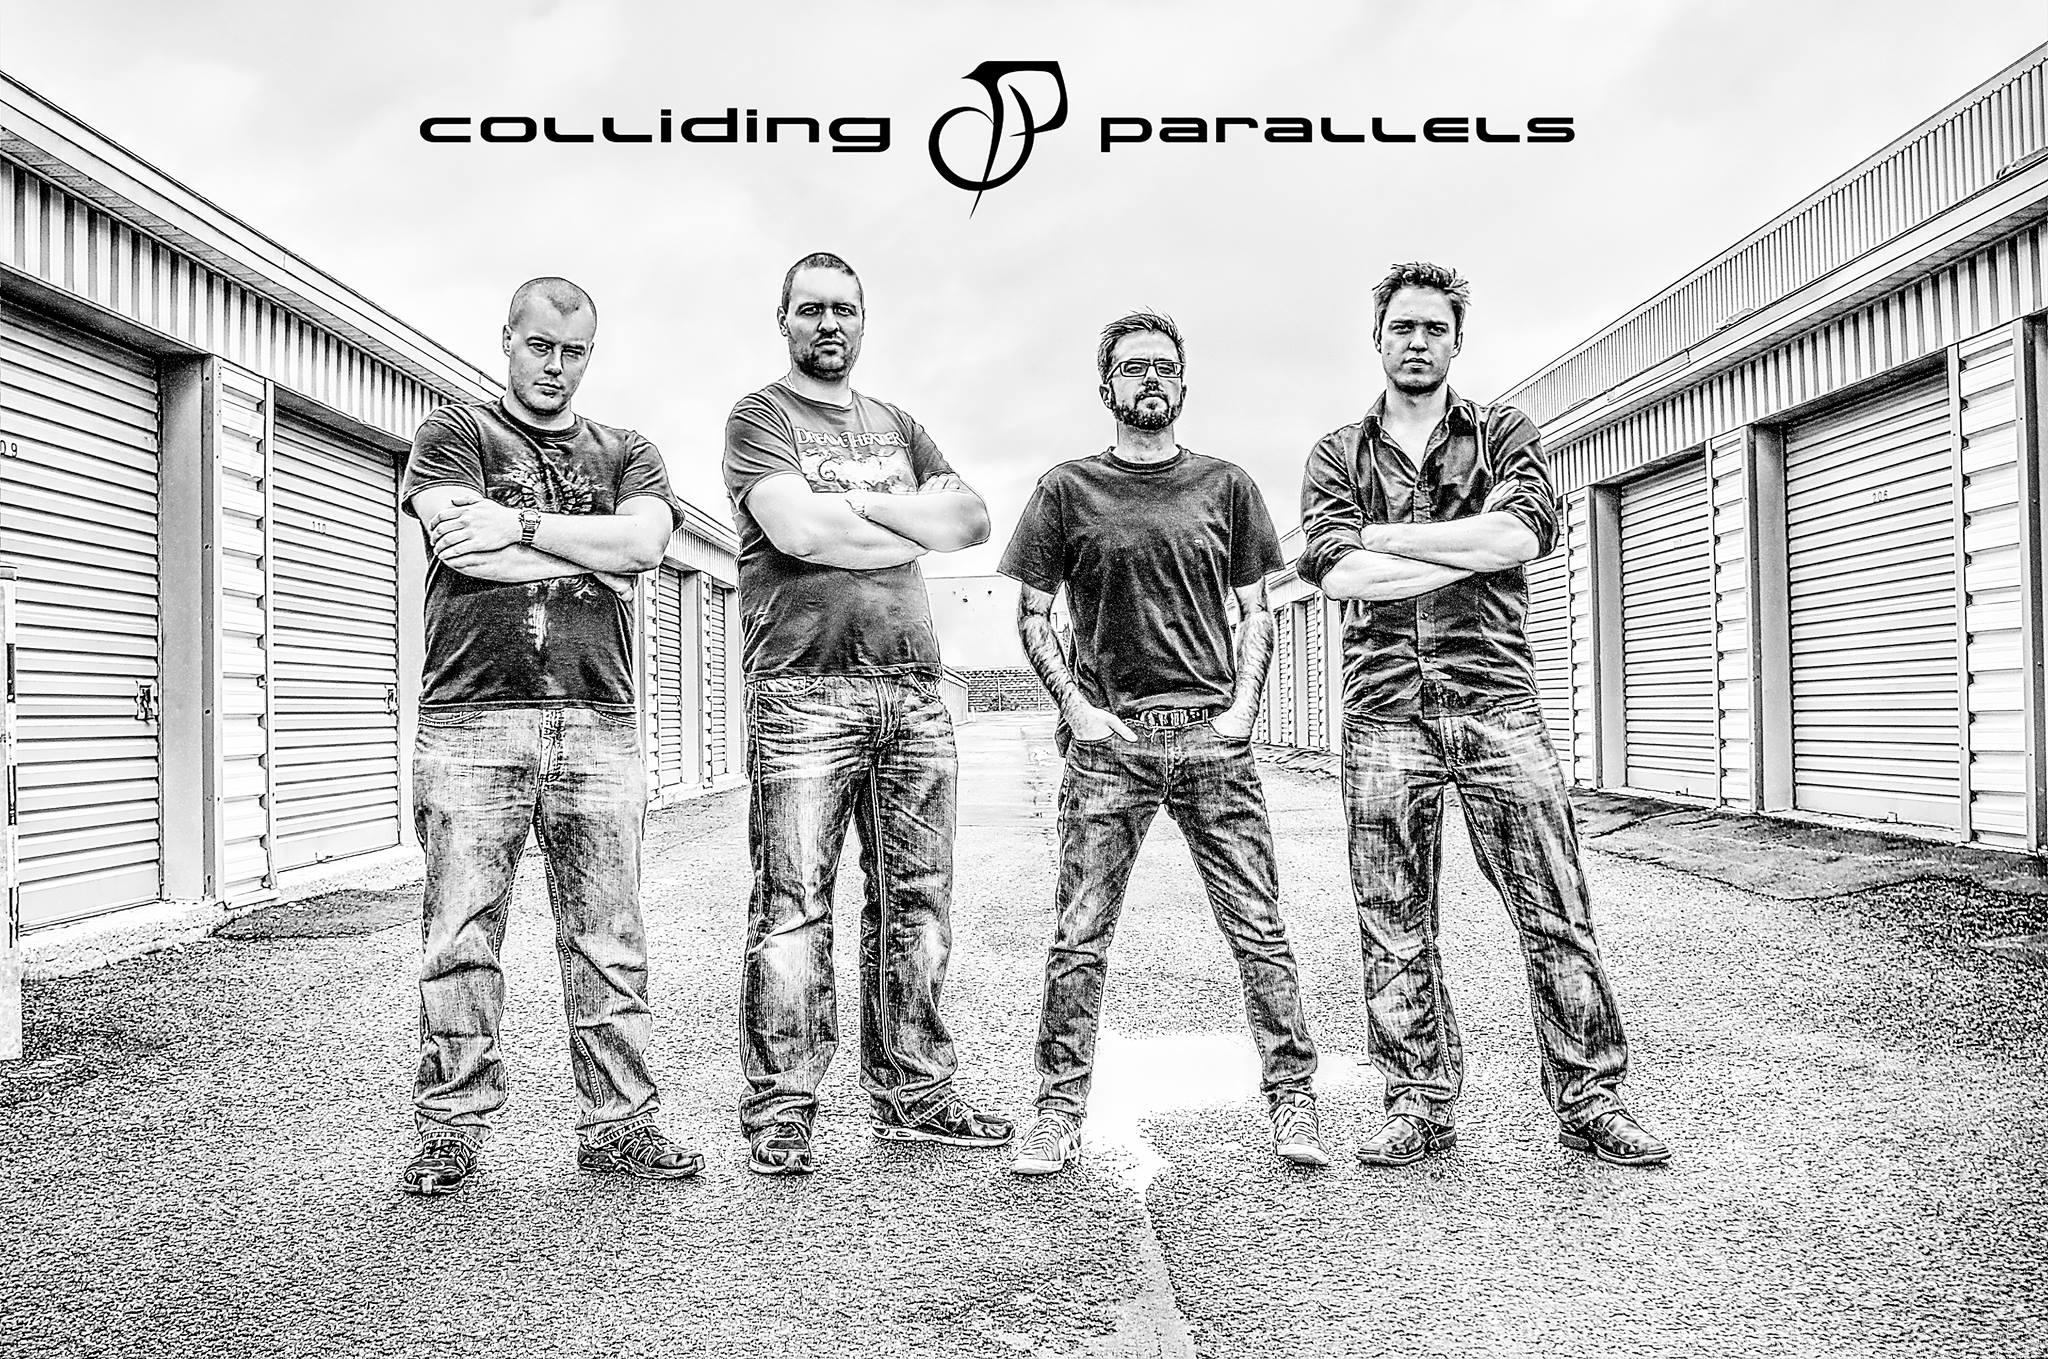 COLLIDING PARALLELS picture